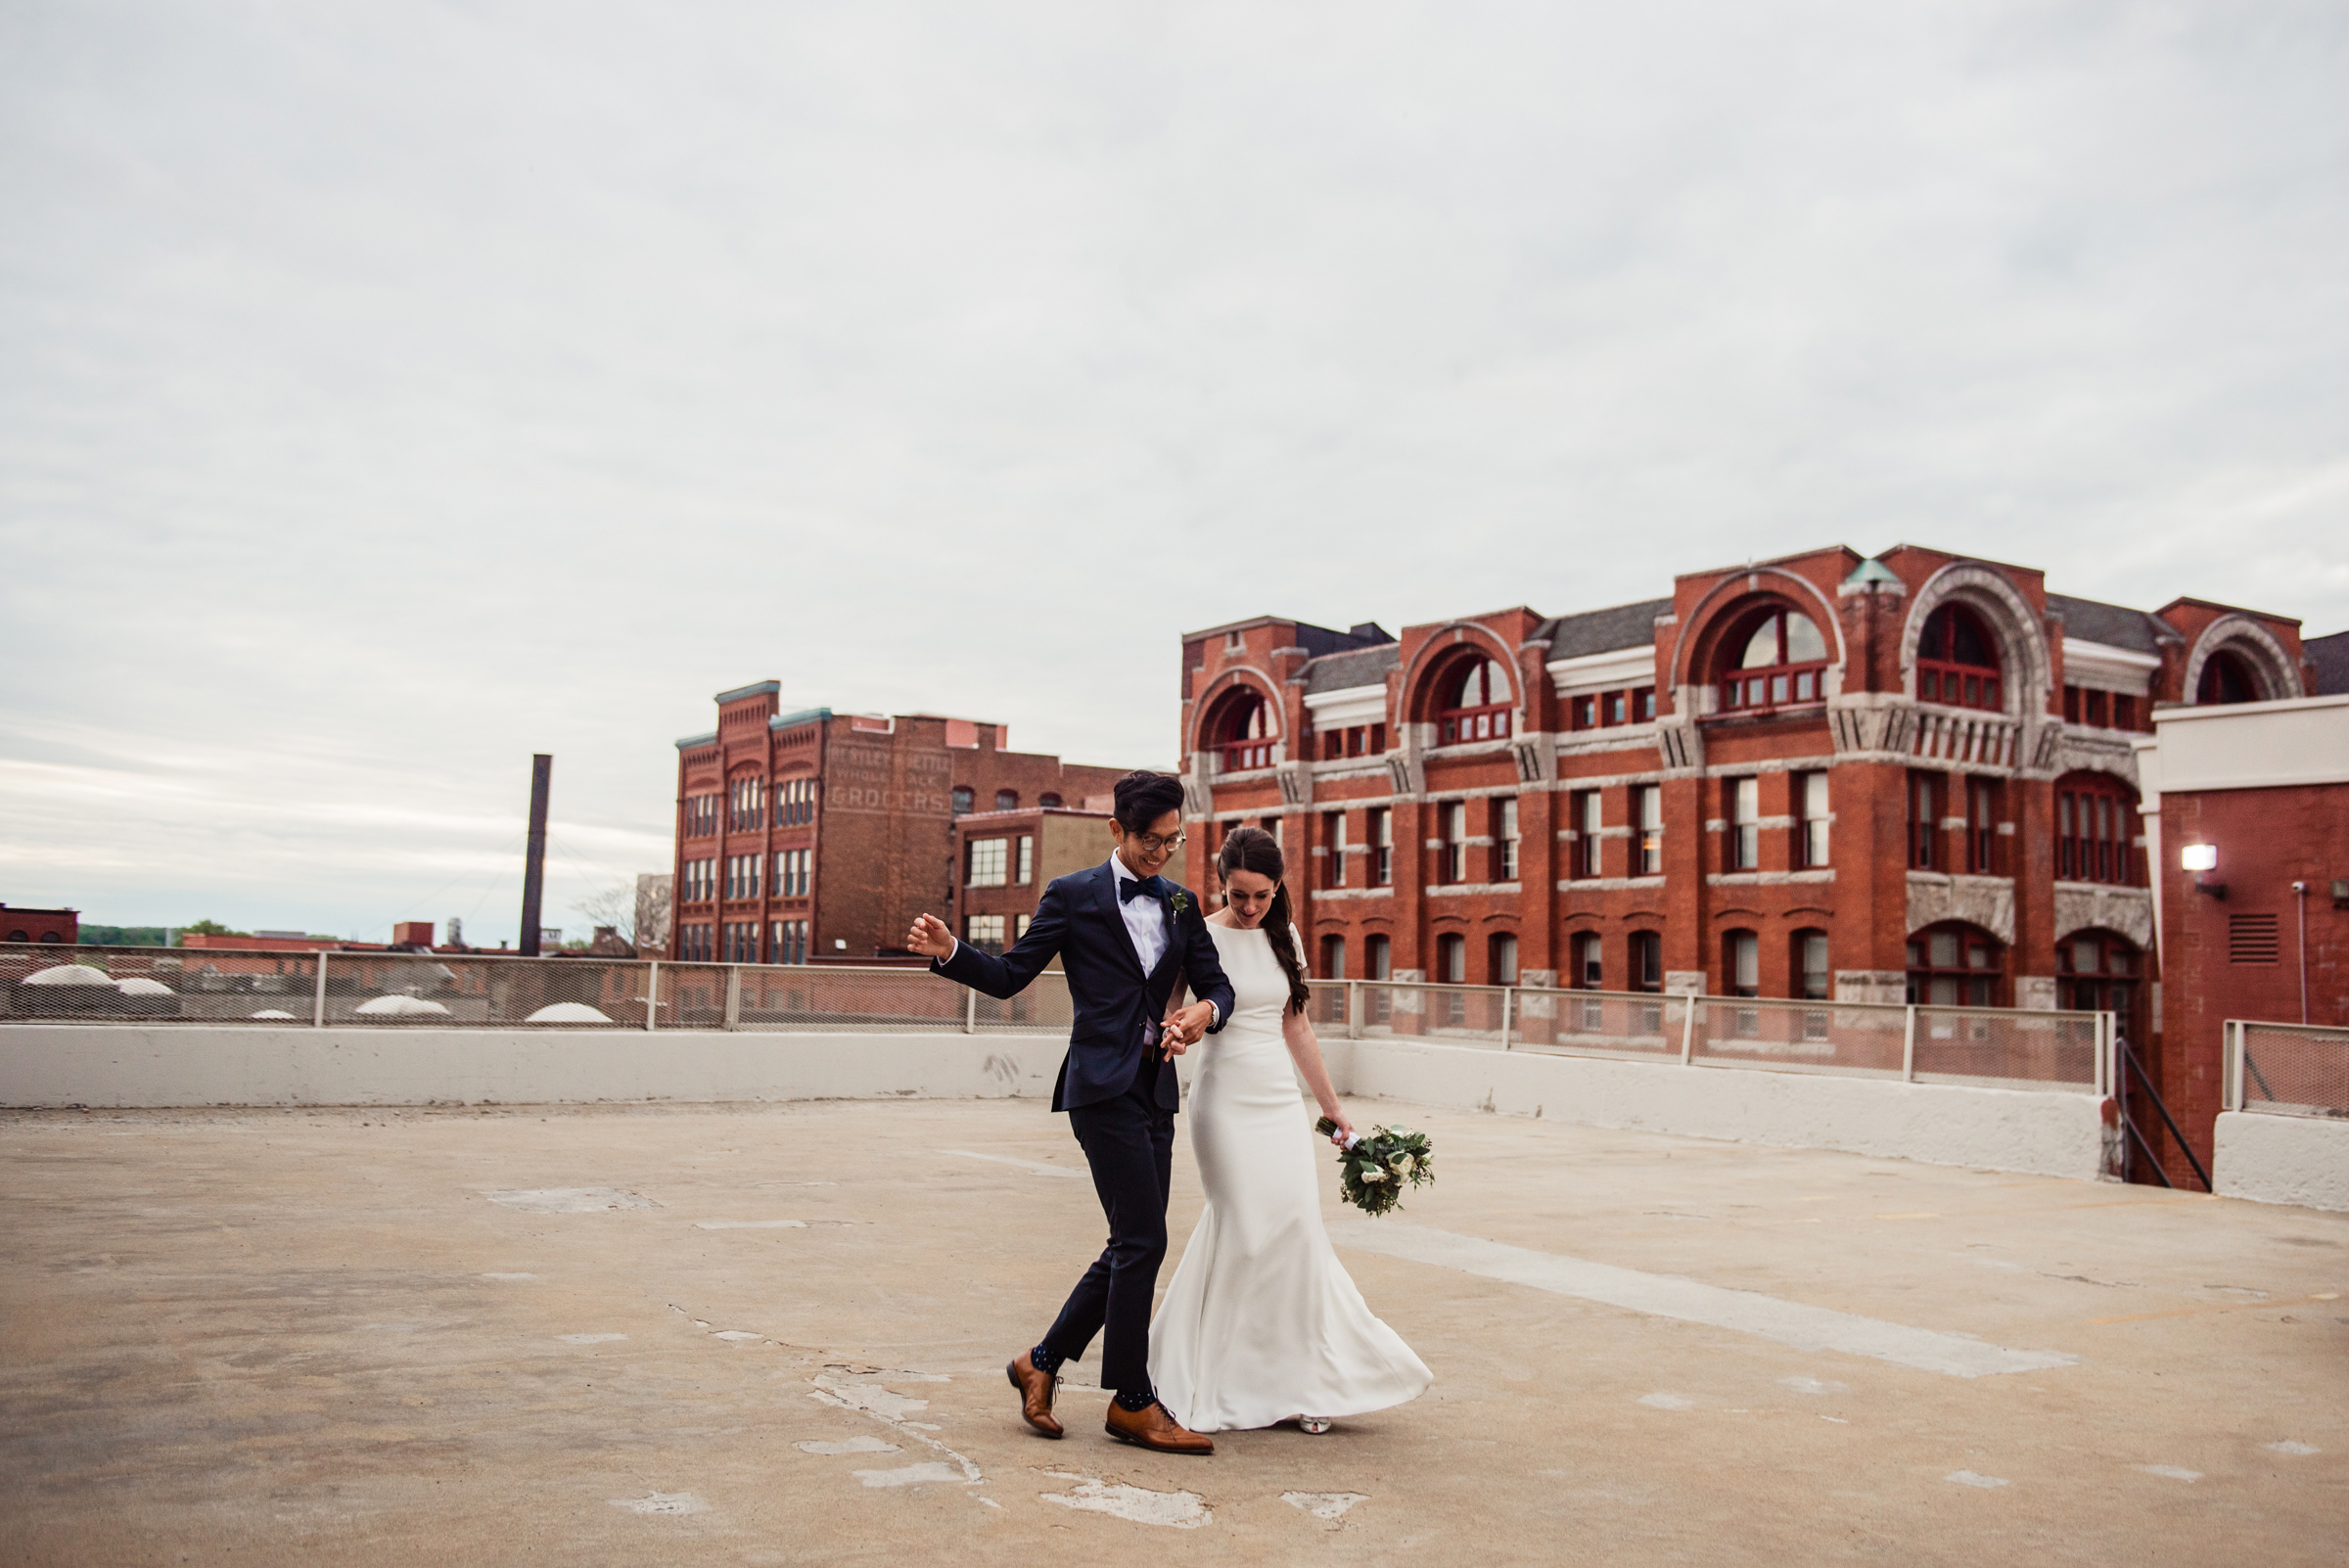 SKY_Armory_Syracuse_Wedding_JILL_STUDIO_Rochester_NY_Photographer_DSC_6282.jpg